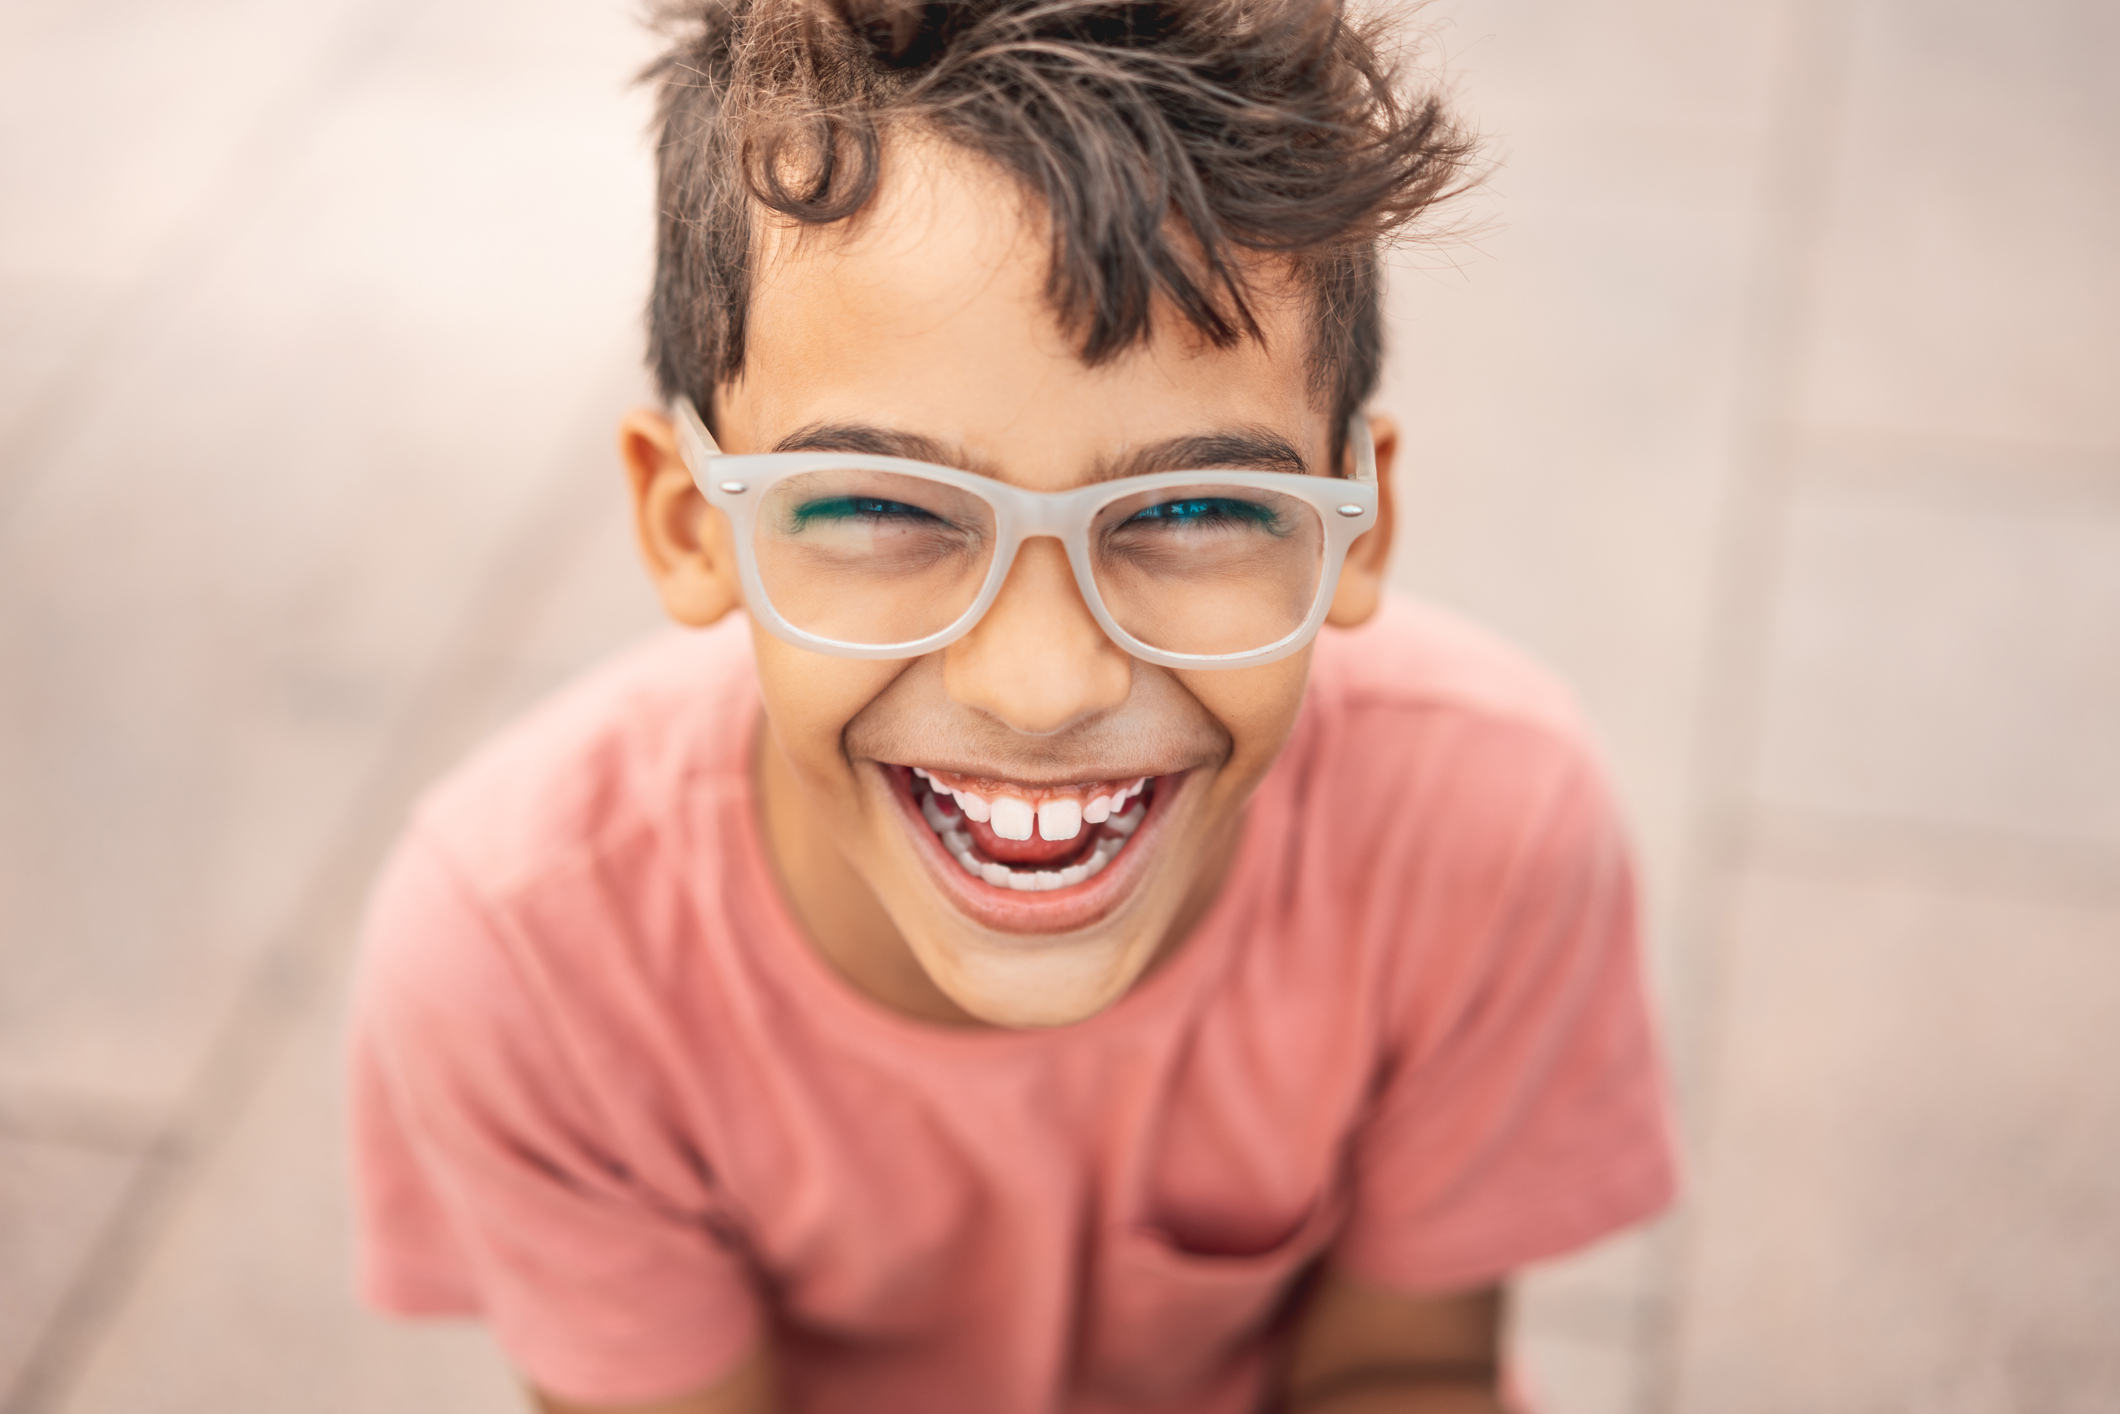 myths about raising boys